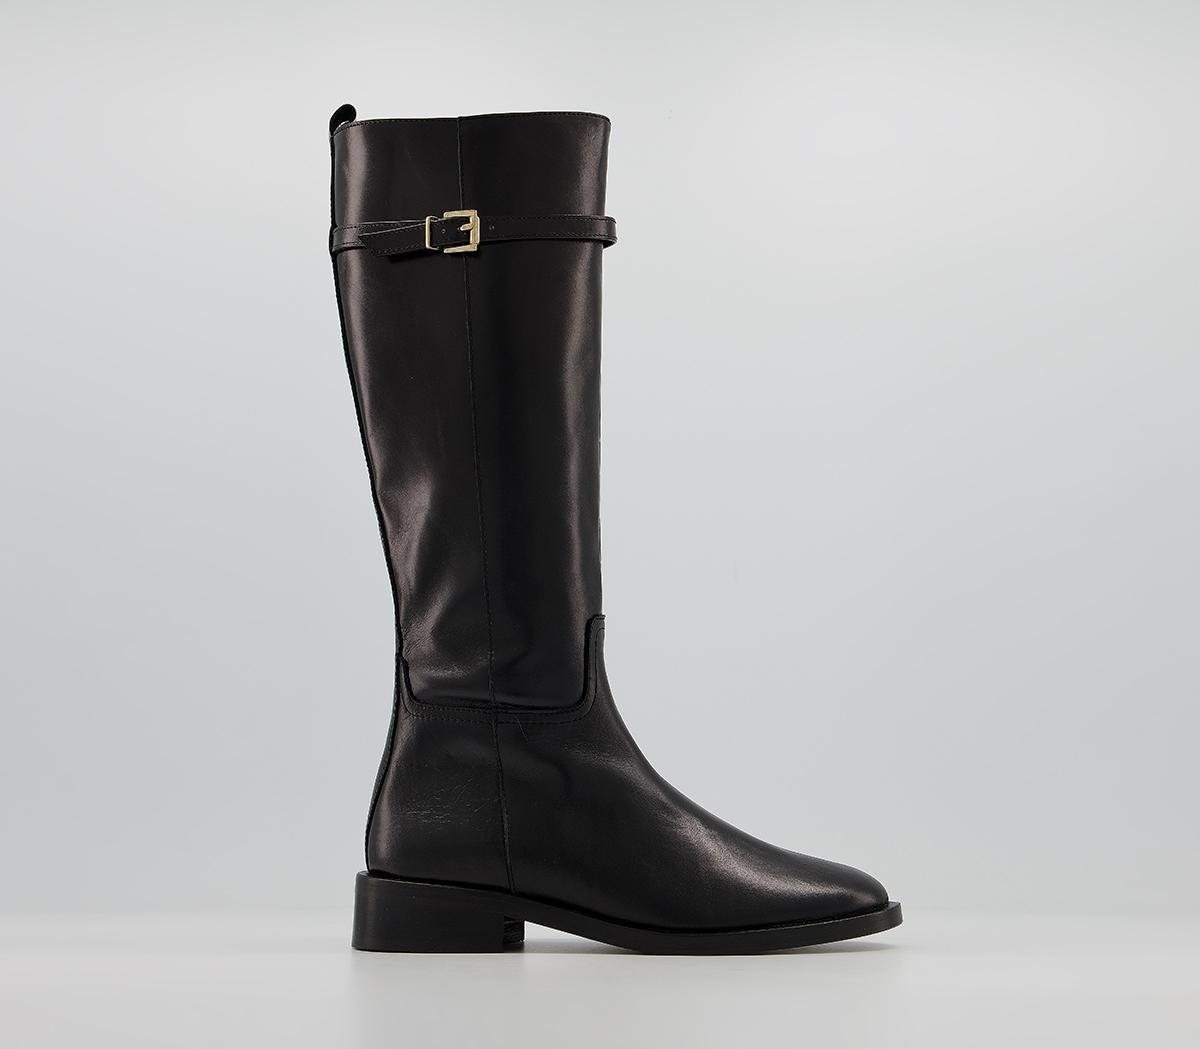 Kiara Smooth Sole Clean Knee Boots